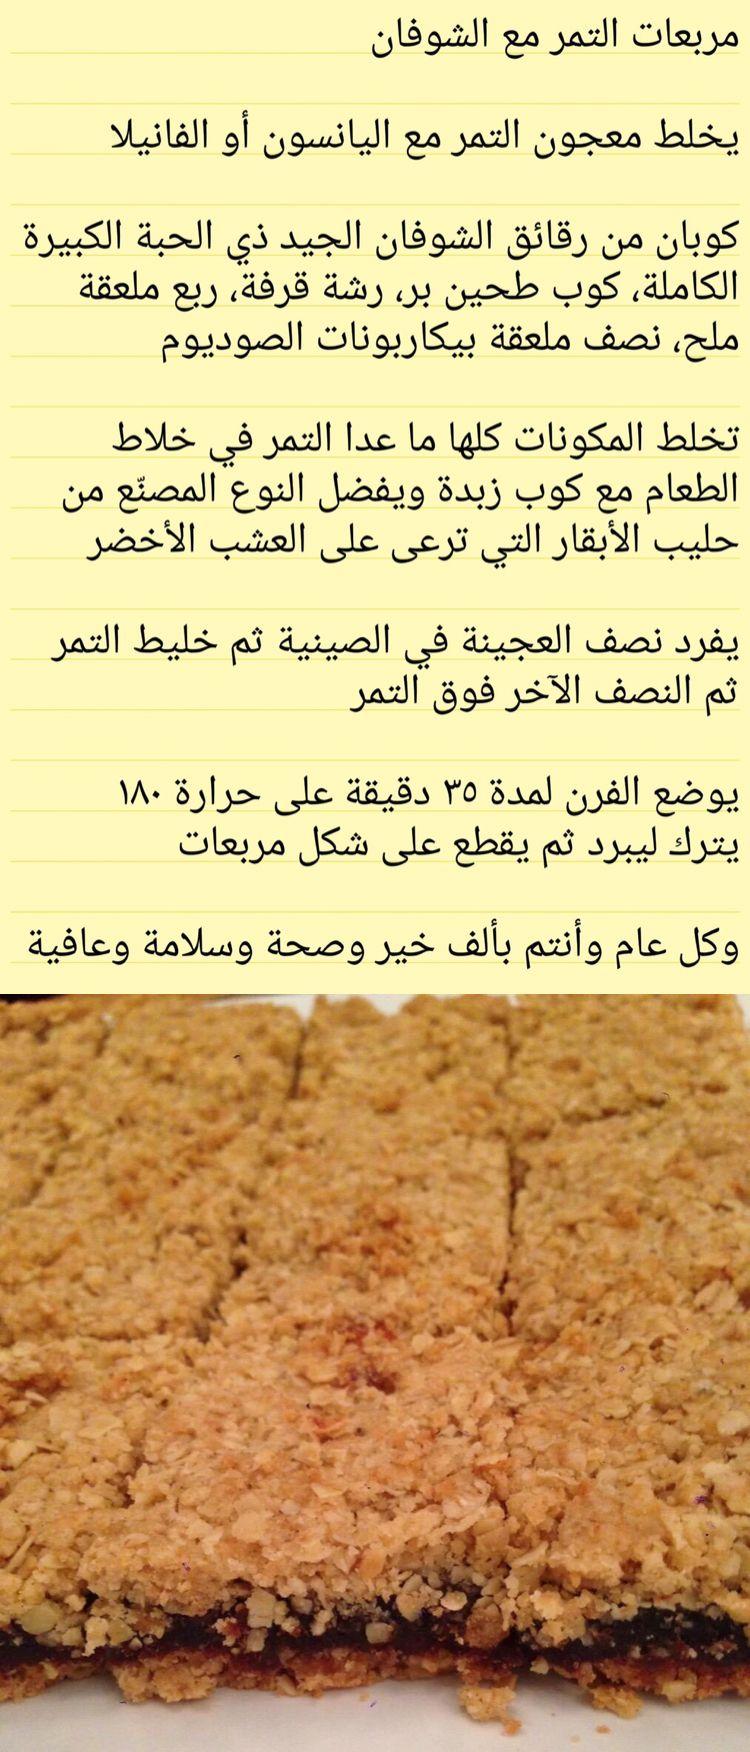 مربعات التمر و الشوفان Healthy Snack Bars Healthy Sugar Arabic Food